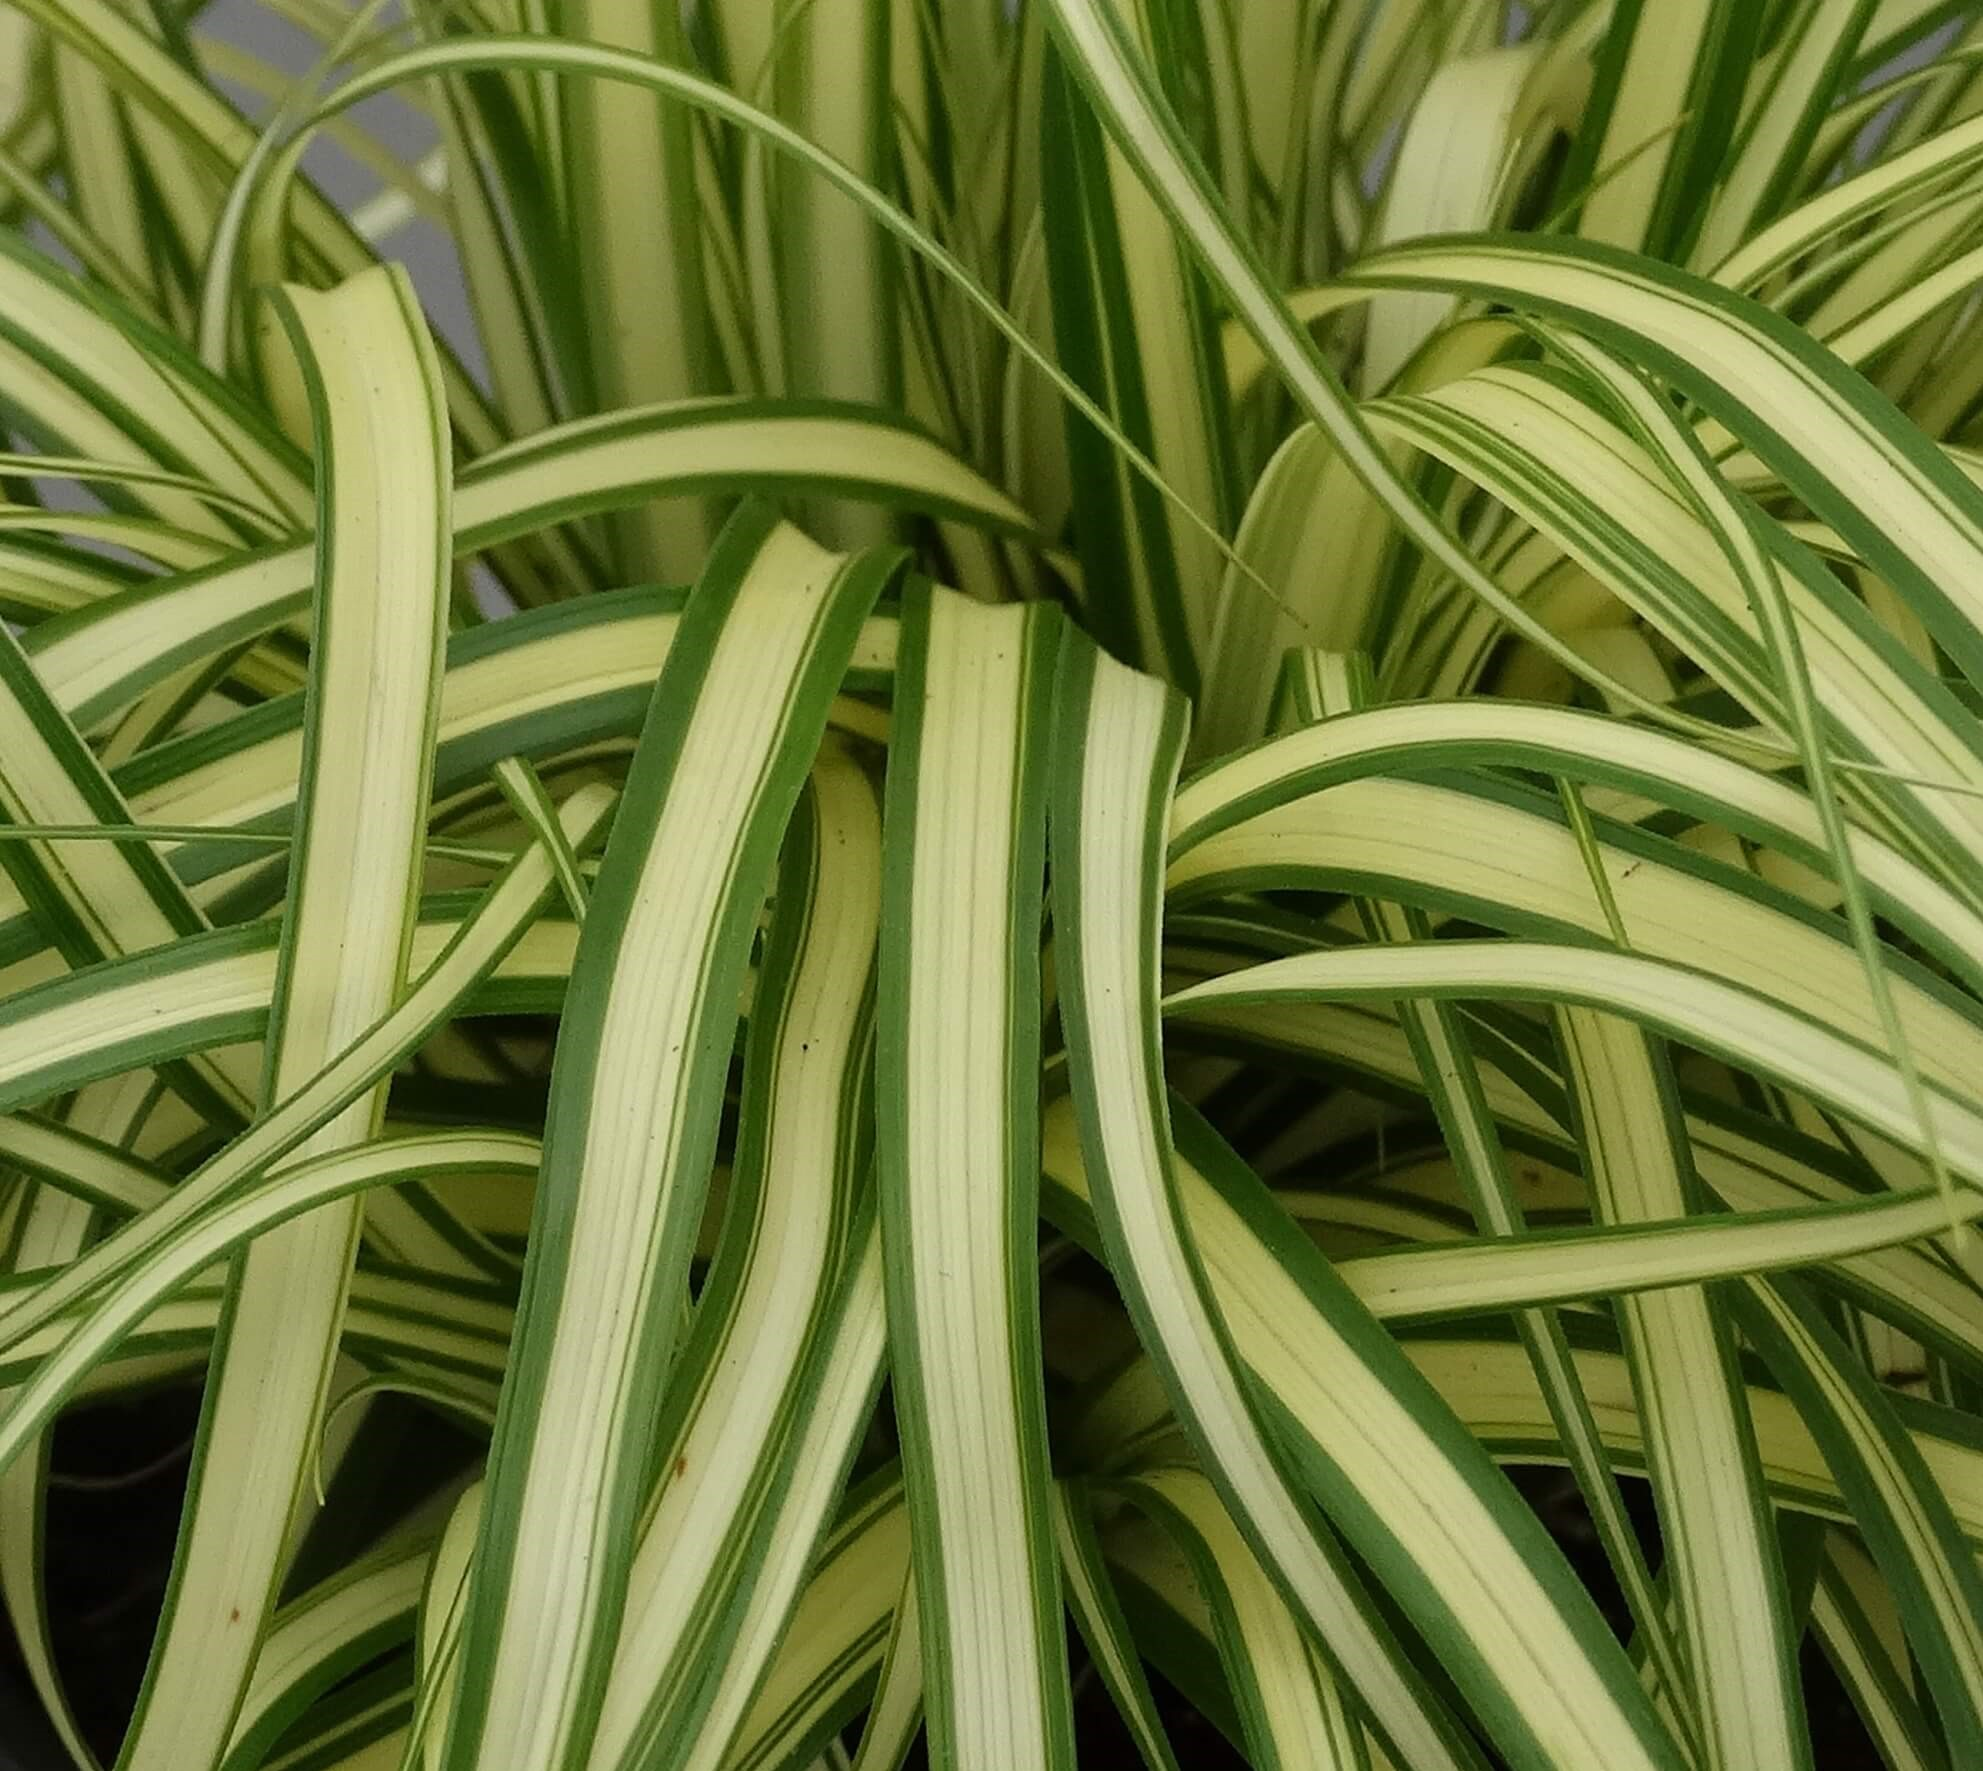 Japan-Gold-Segge (Carex oshimensis) 'Maxigold' T12 - winterhart